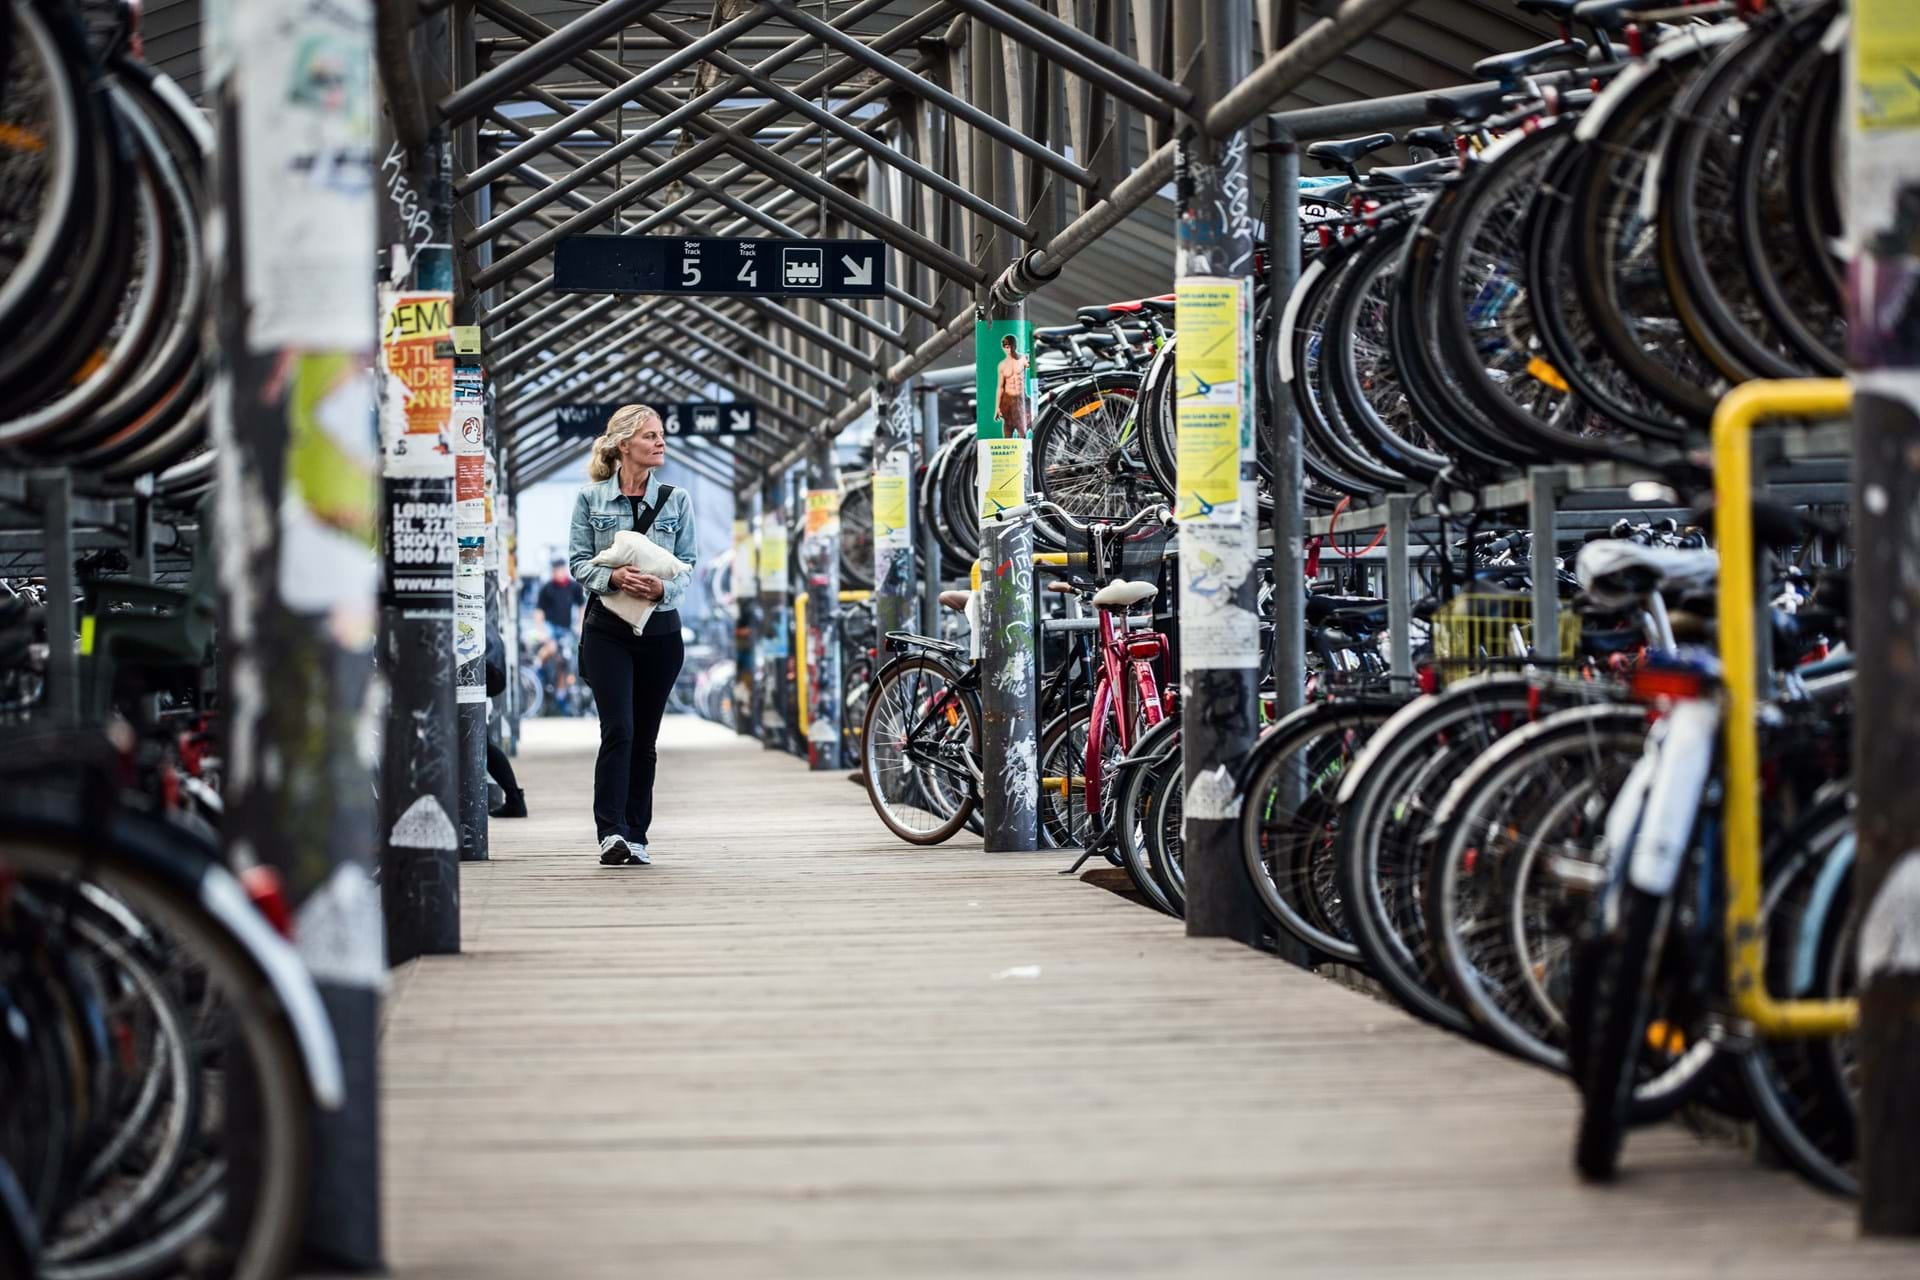 Gratis Cykel Århus